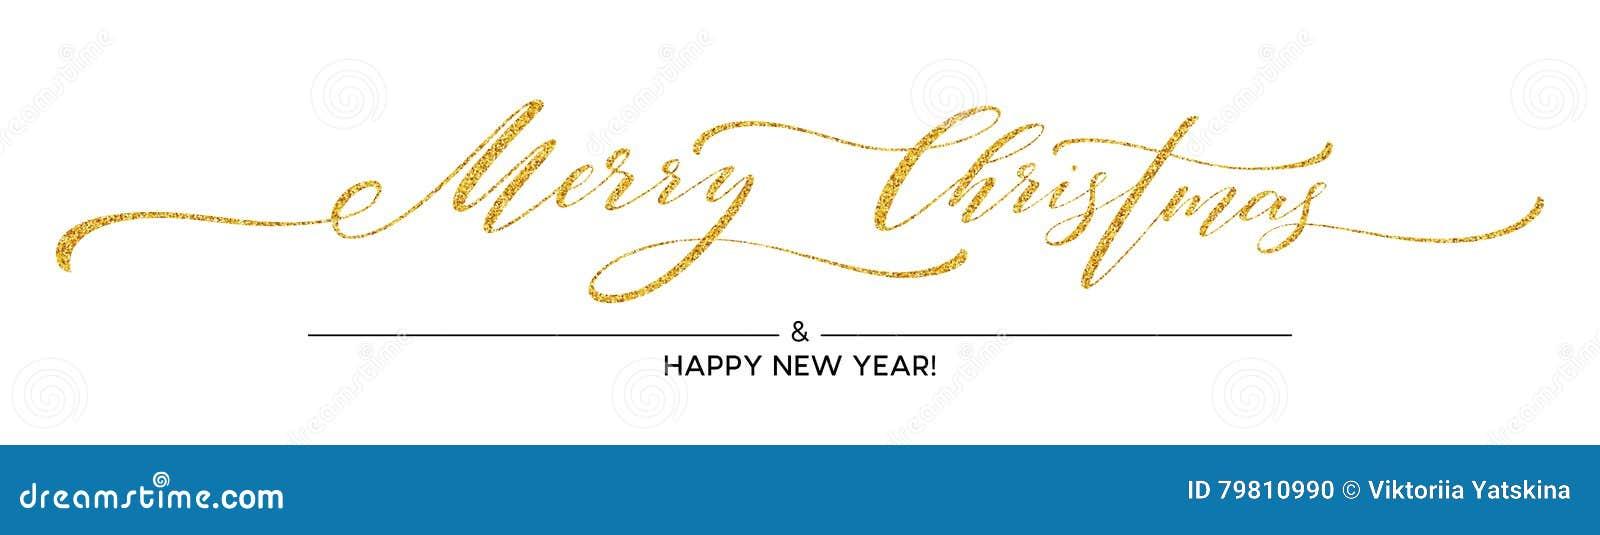 Gold Glitter Merry Christmas Lettering Design Greeting